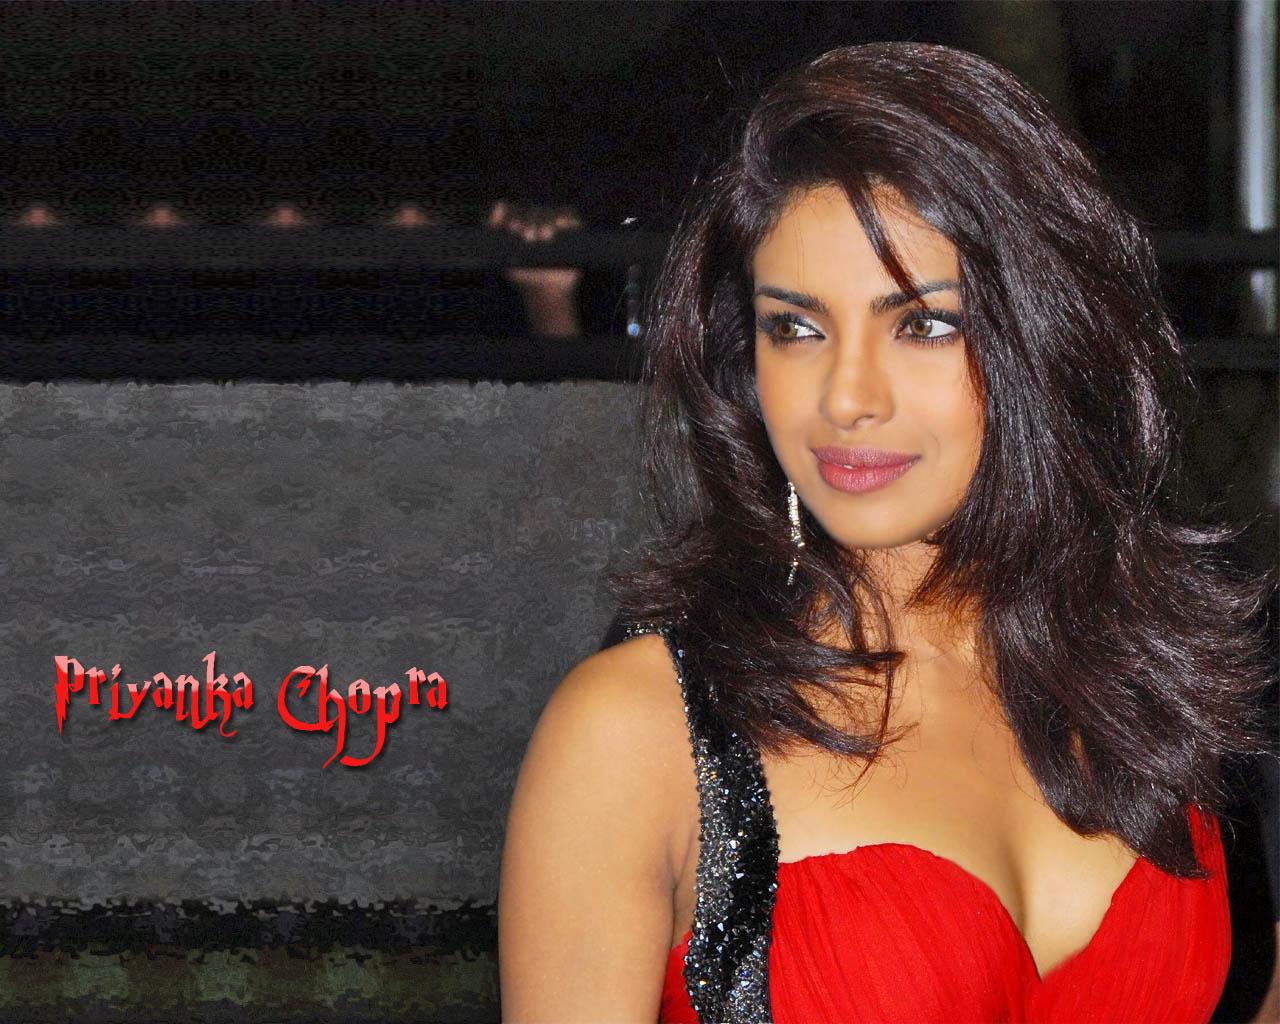 Priyanka Chopra Latest Unseen Photo In Bikini  The Aj -5877